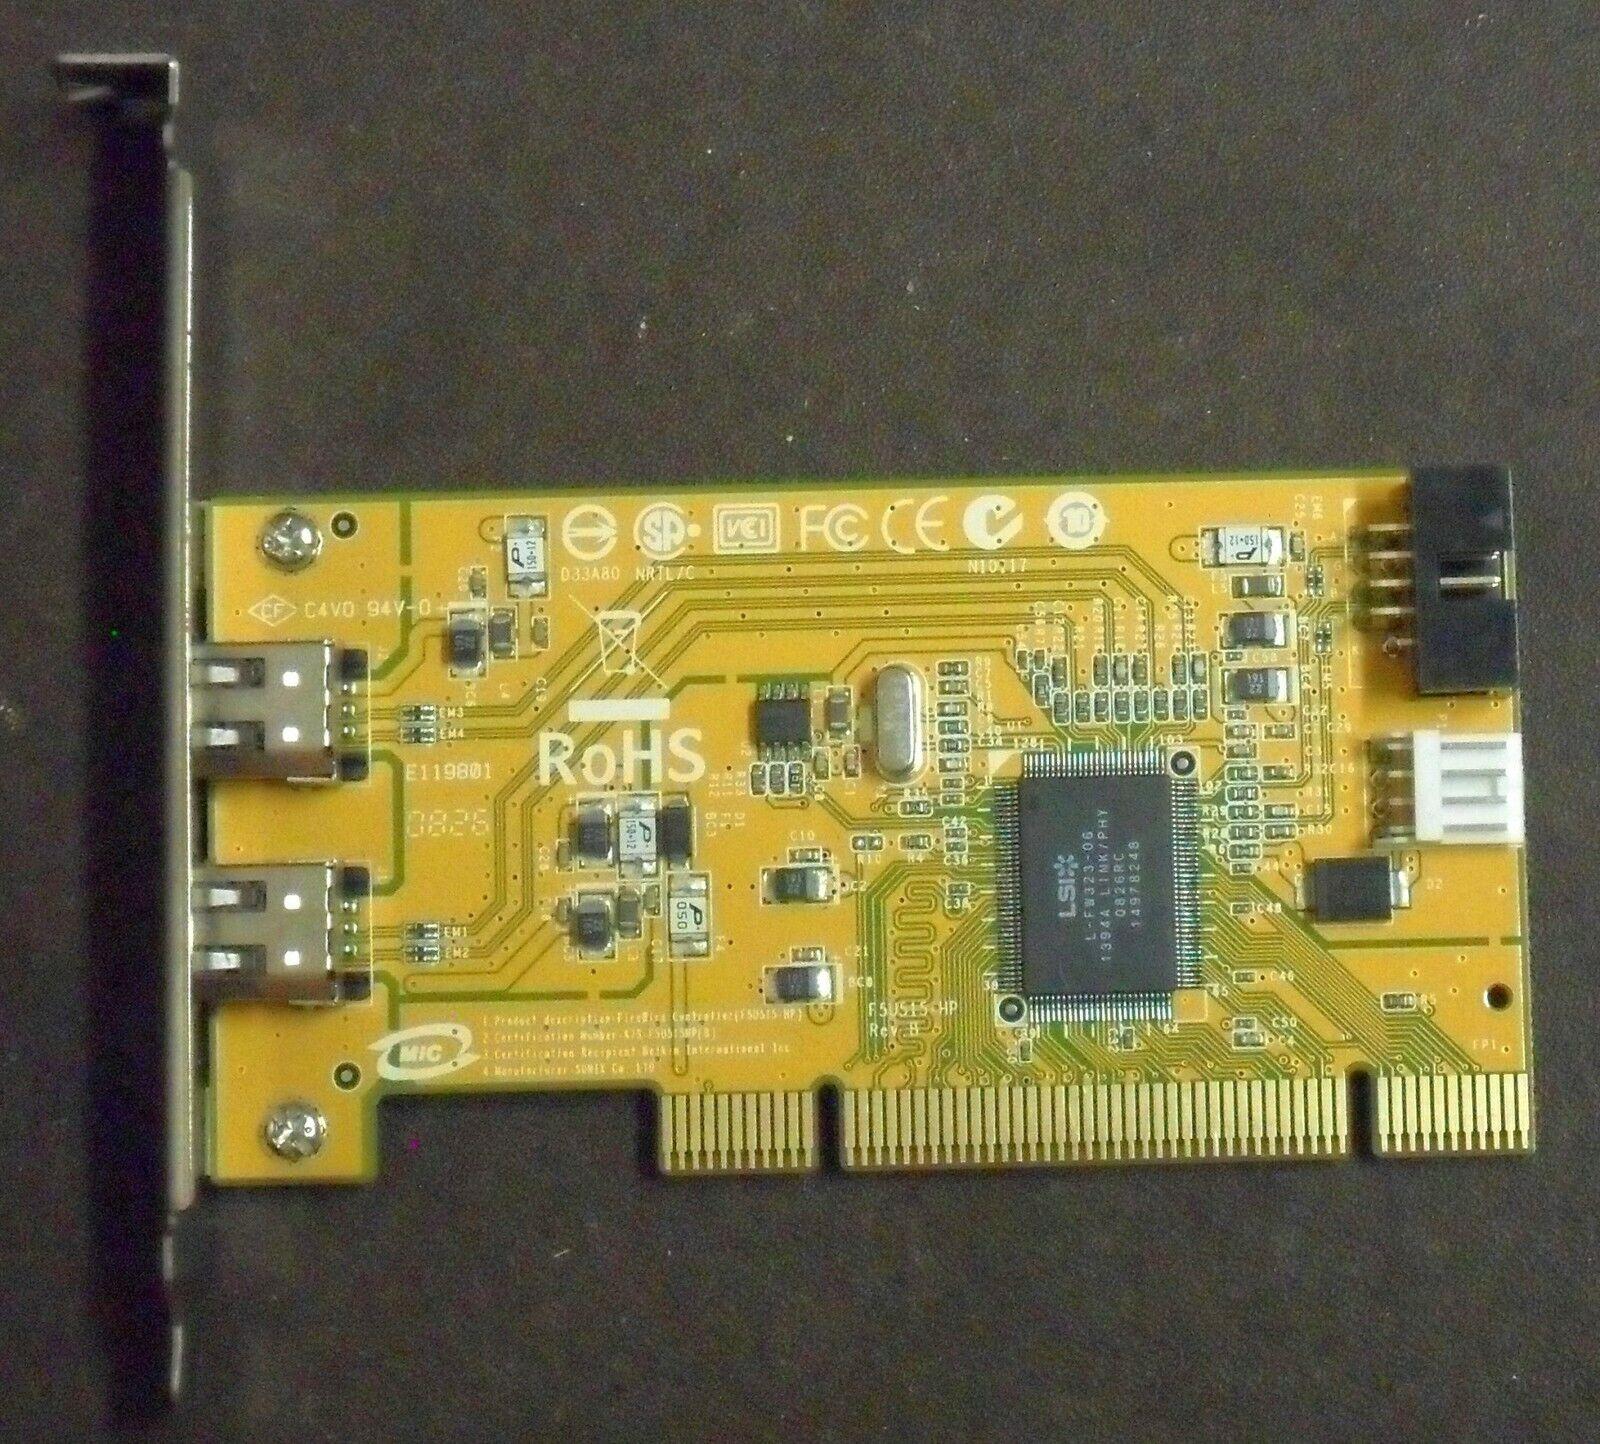 1394 FireWire PCI (32bit) 3.3v or 5v